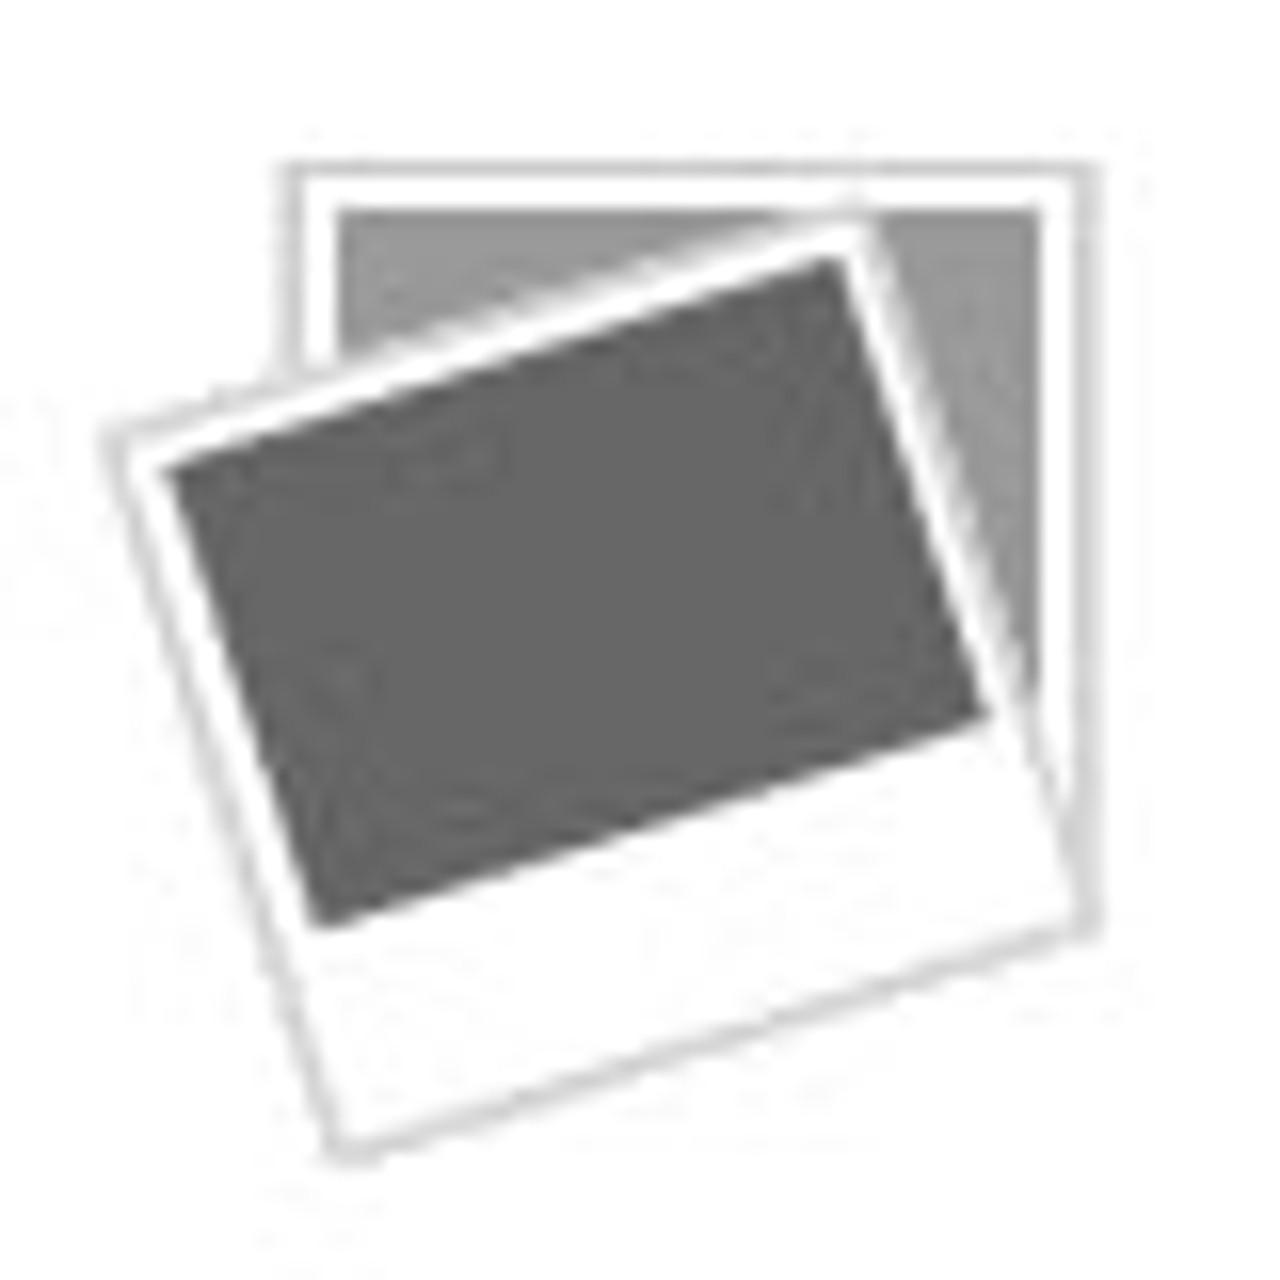 DELL DXX7K PowerEdge R520 riser #1 board